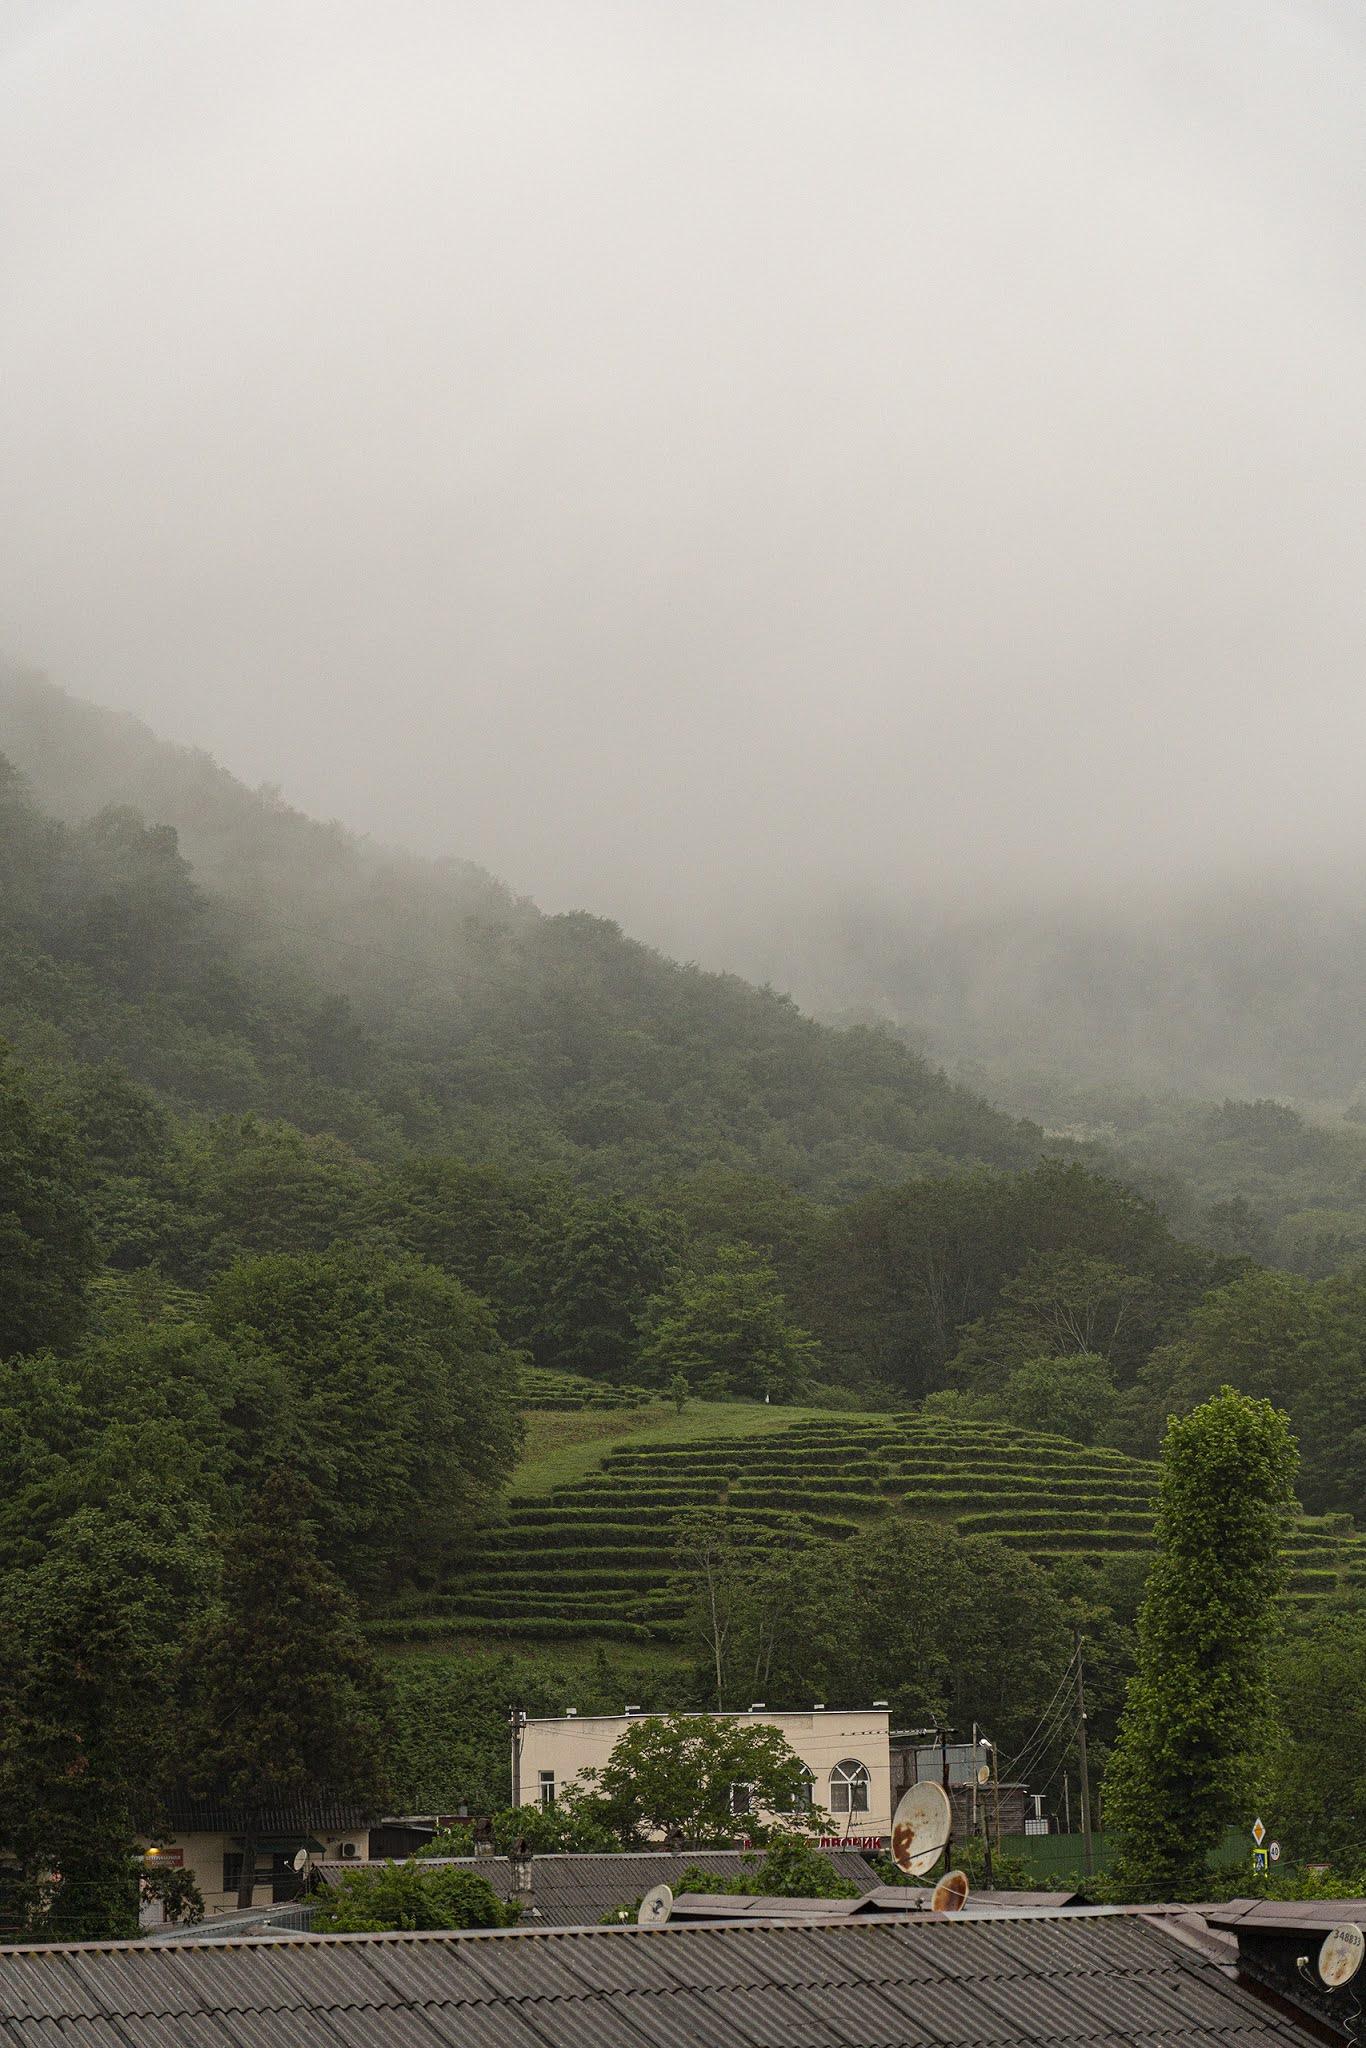 Dagomys Volkovka tea plantations fog mountains hills cloud spreads photo Igor Novik